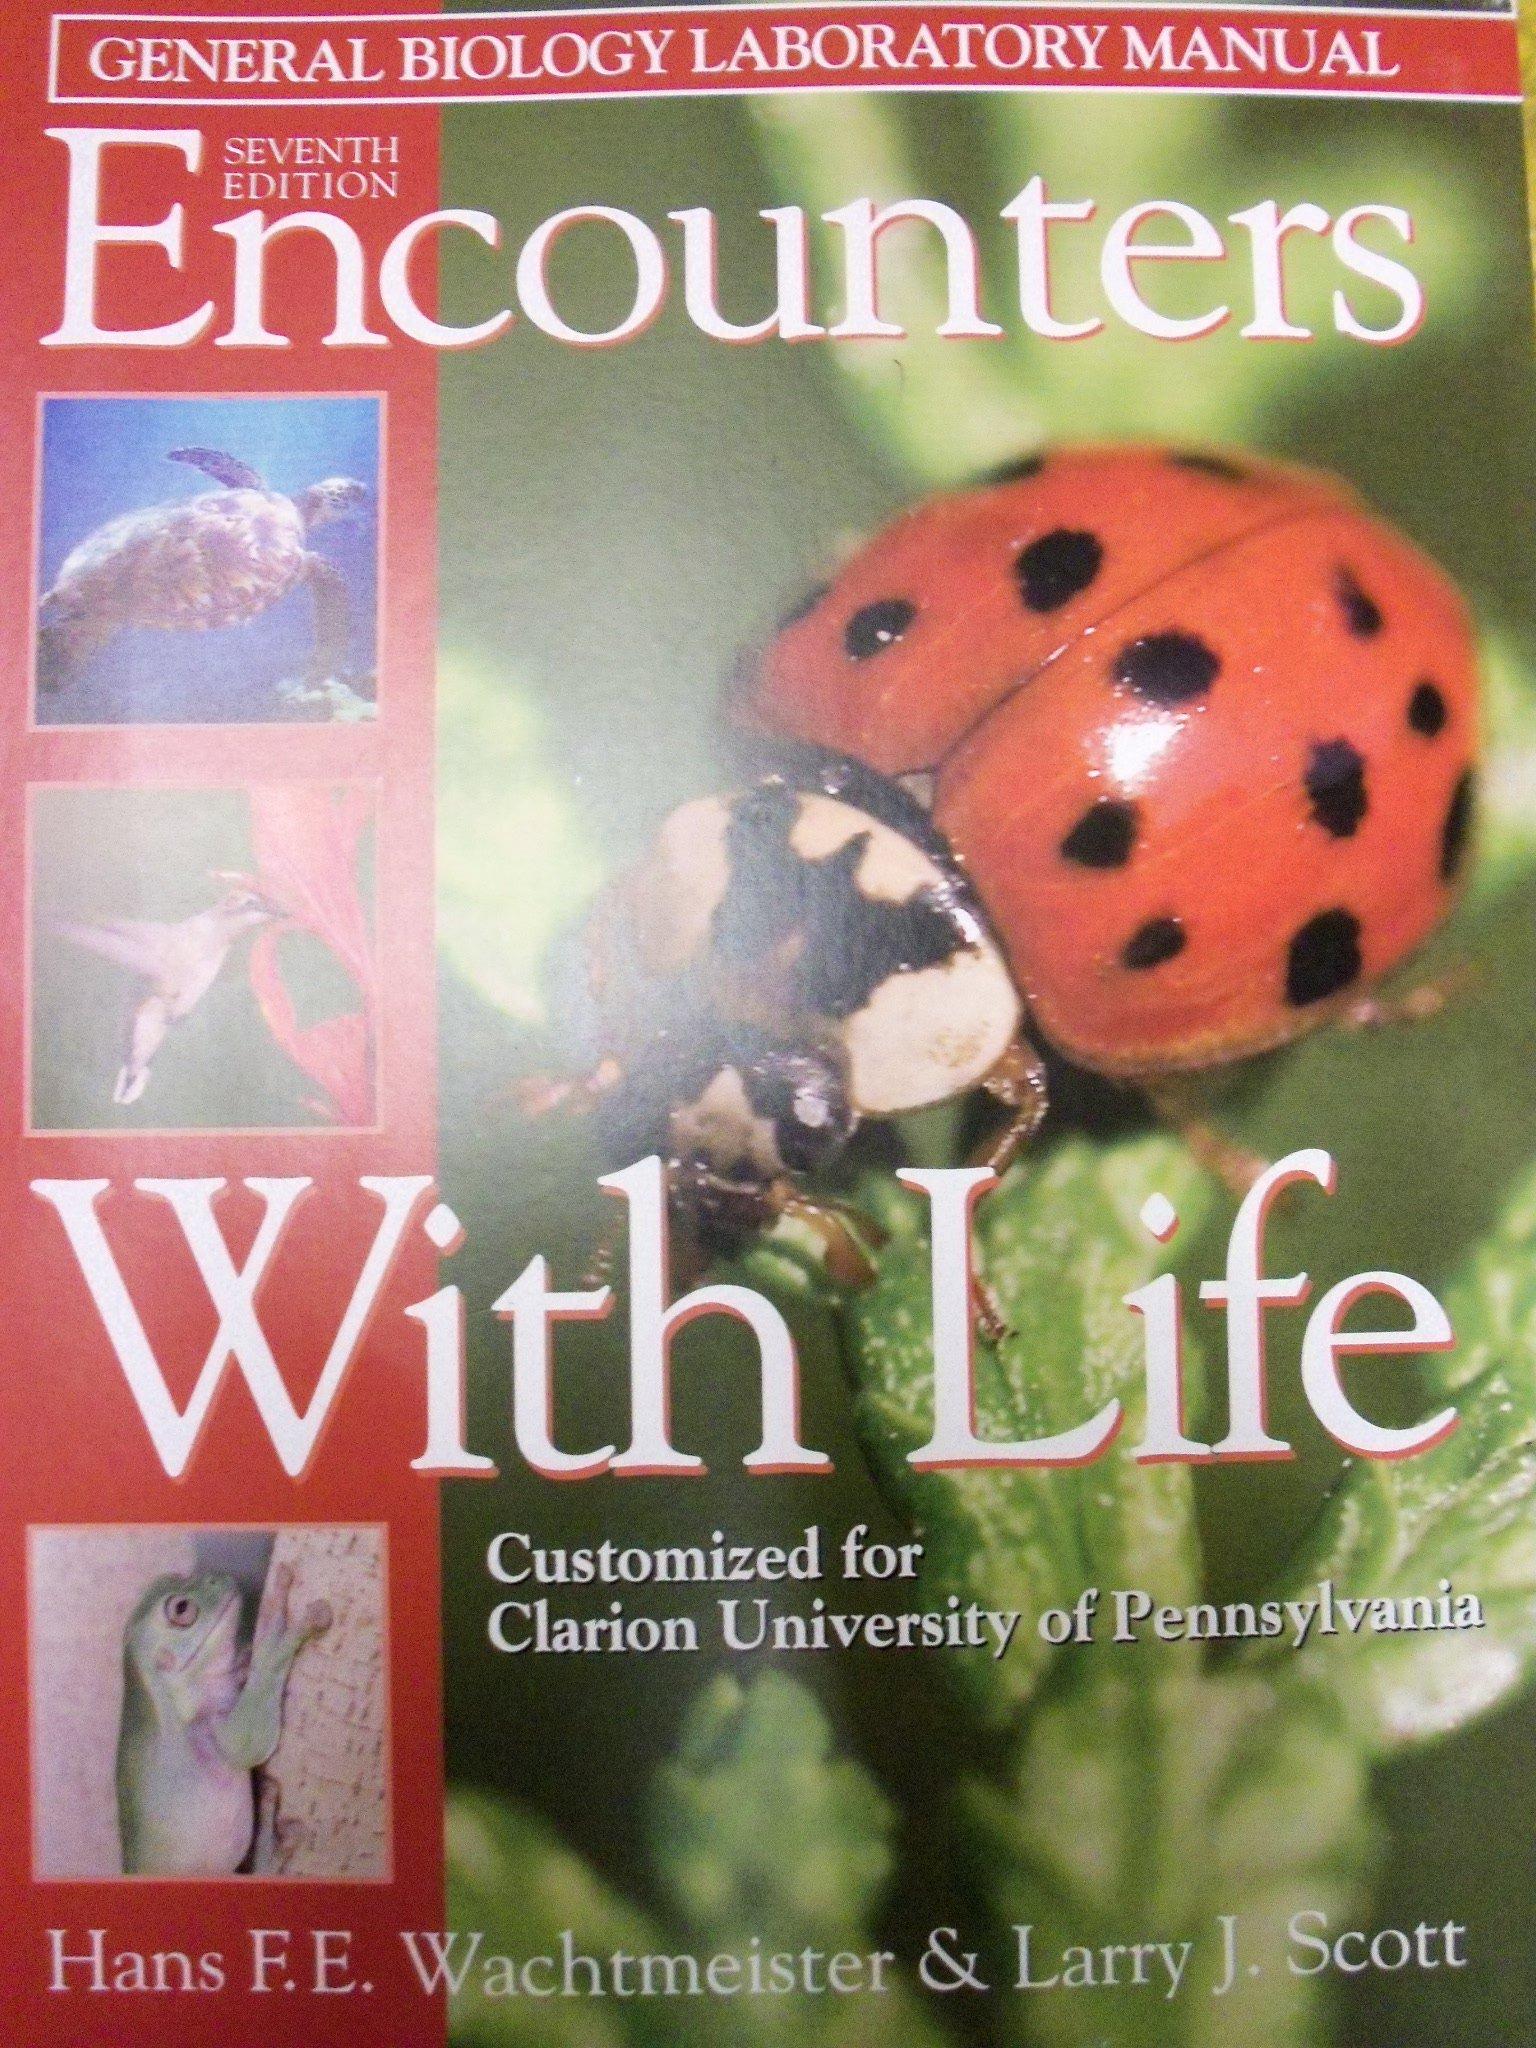 Encounters With Life; 7e (Clarion University Of Pennsylvania) [Loose Leaf]:  Larry J. Scott, Hans F.E. Wachtmeister: 9780895828422: Amazon.com: Books